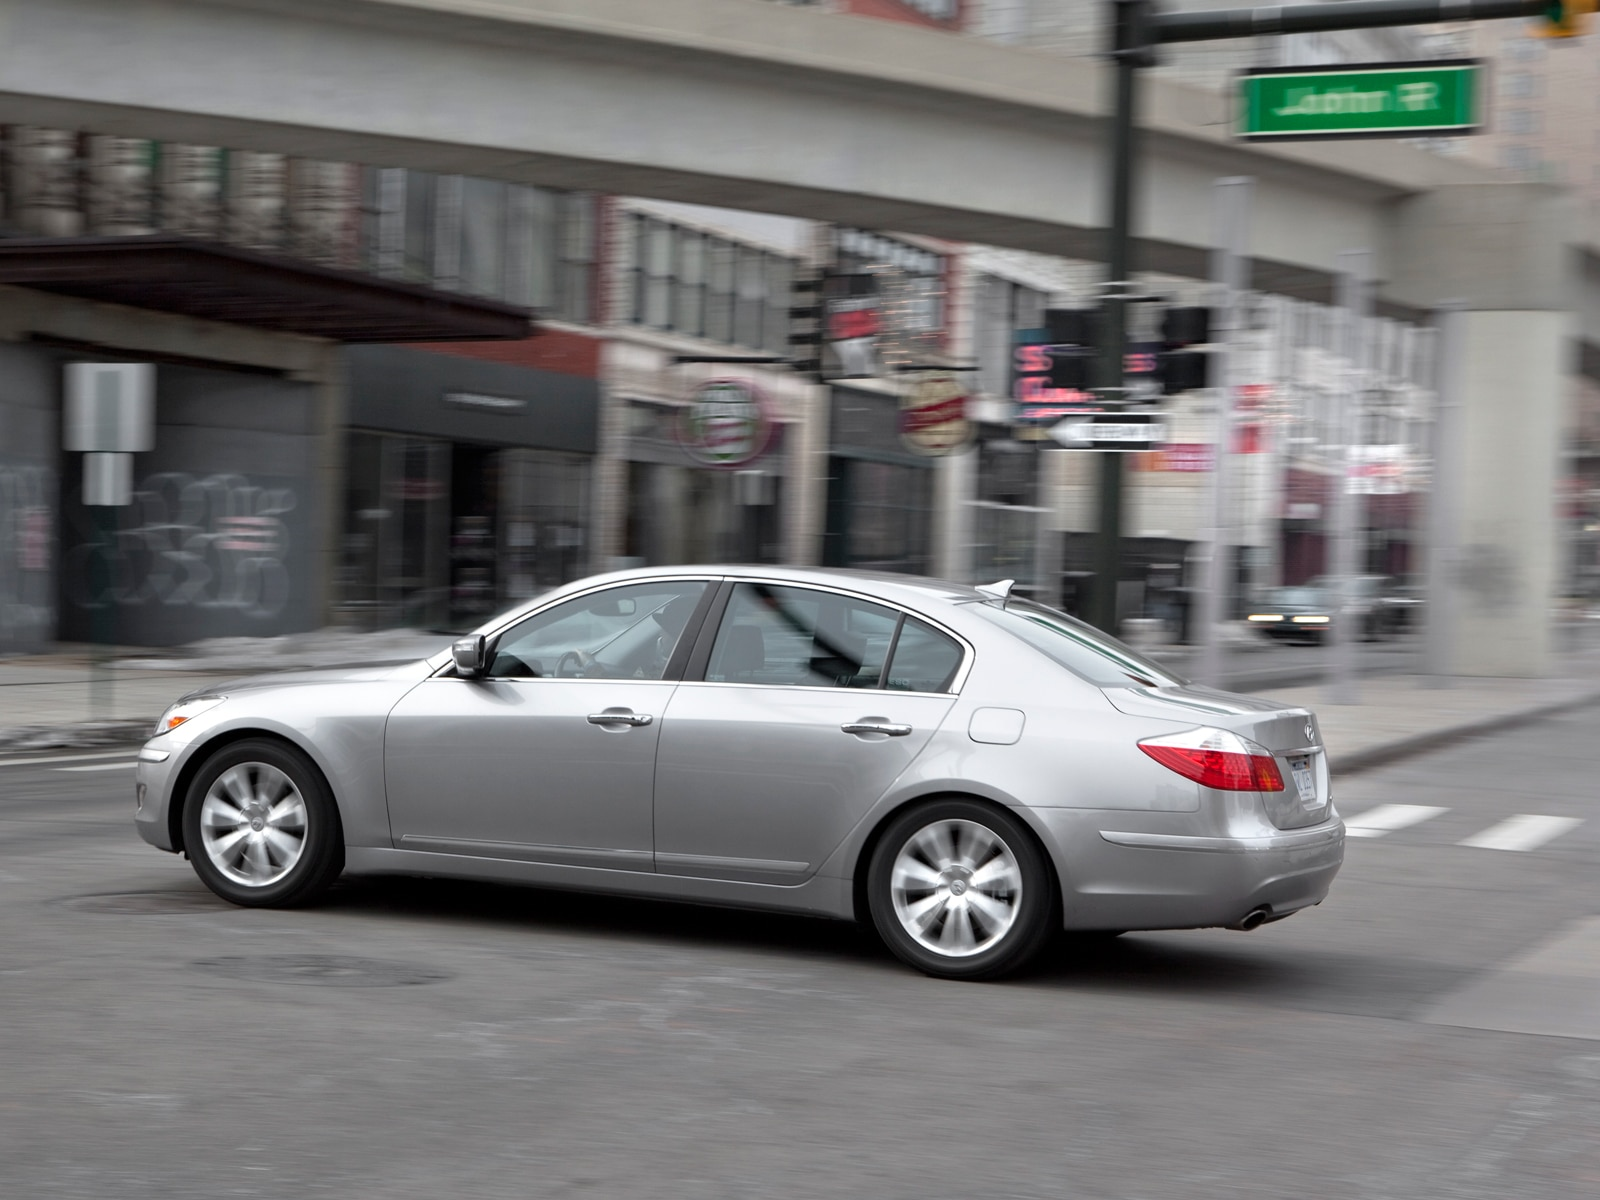 0910 02 Z 2009 Hyundai Genesis 46 Side View